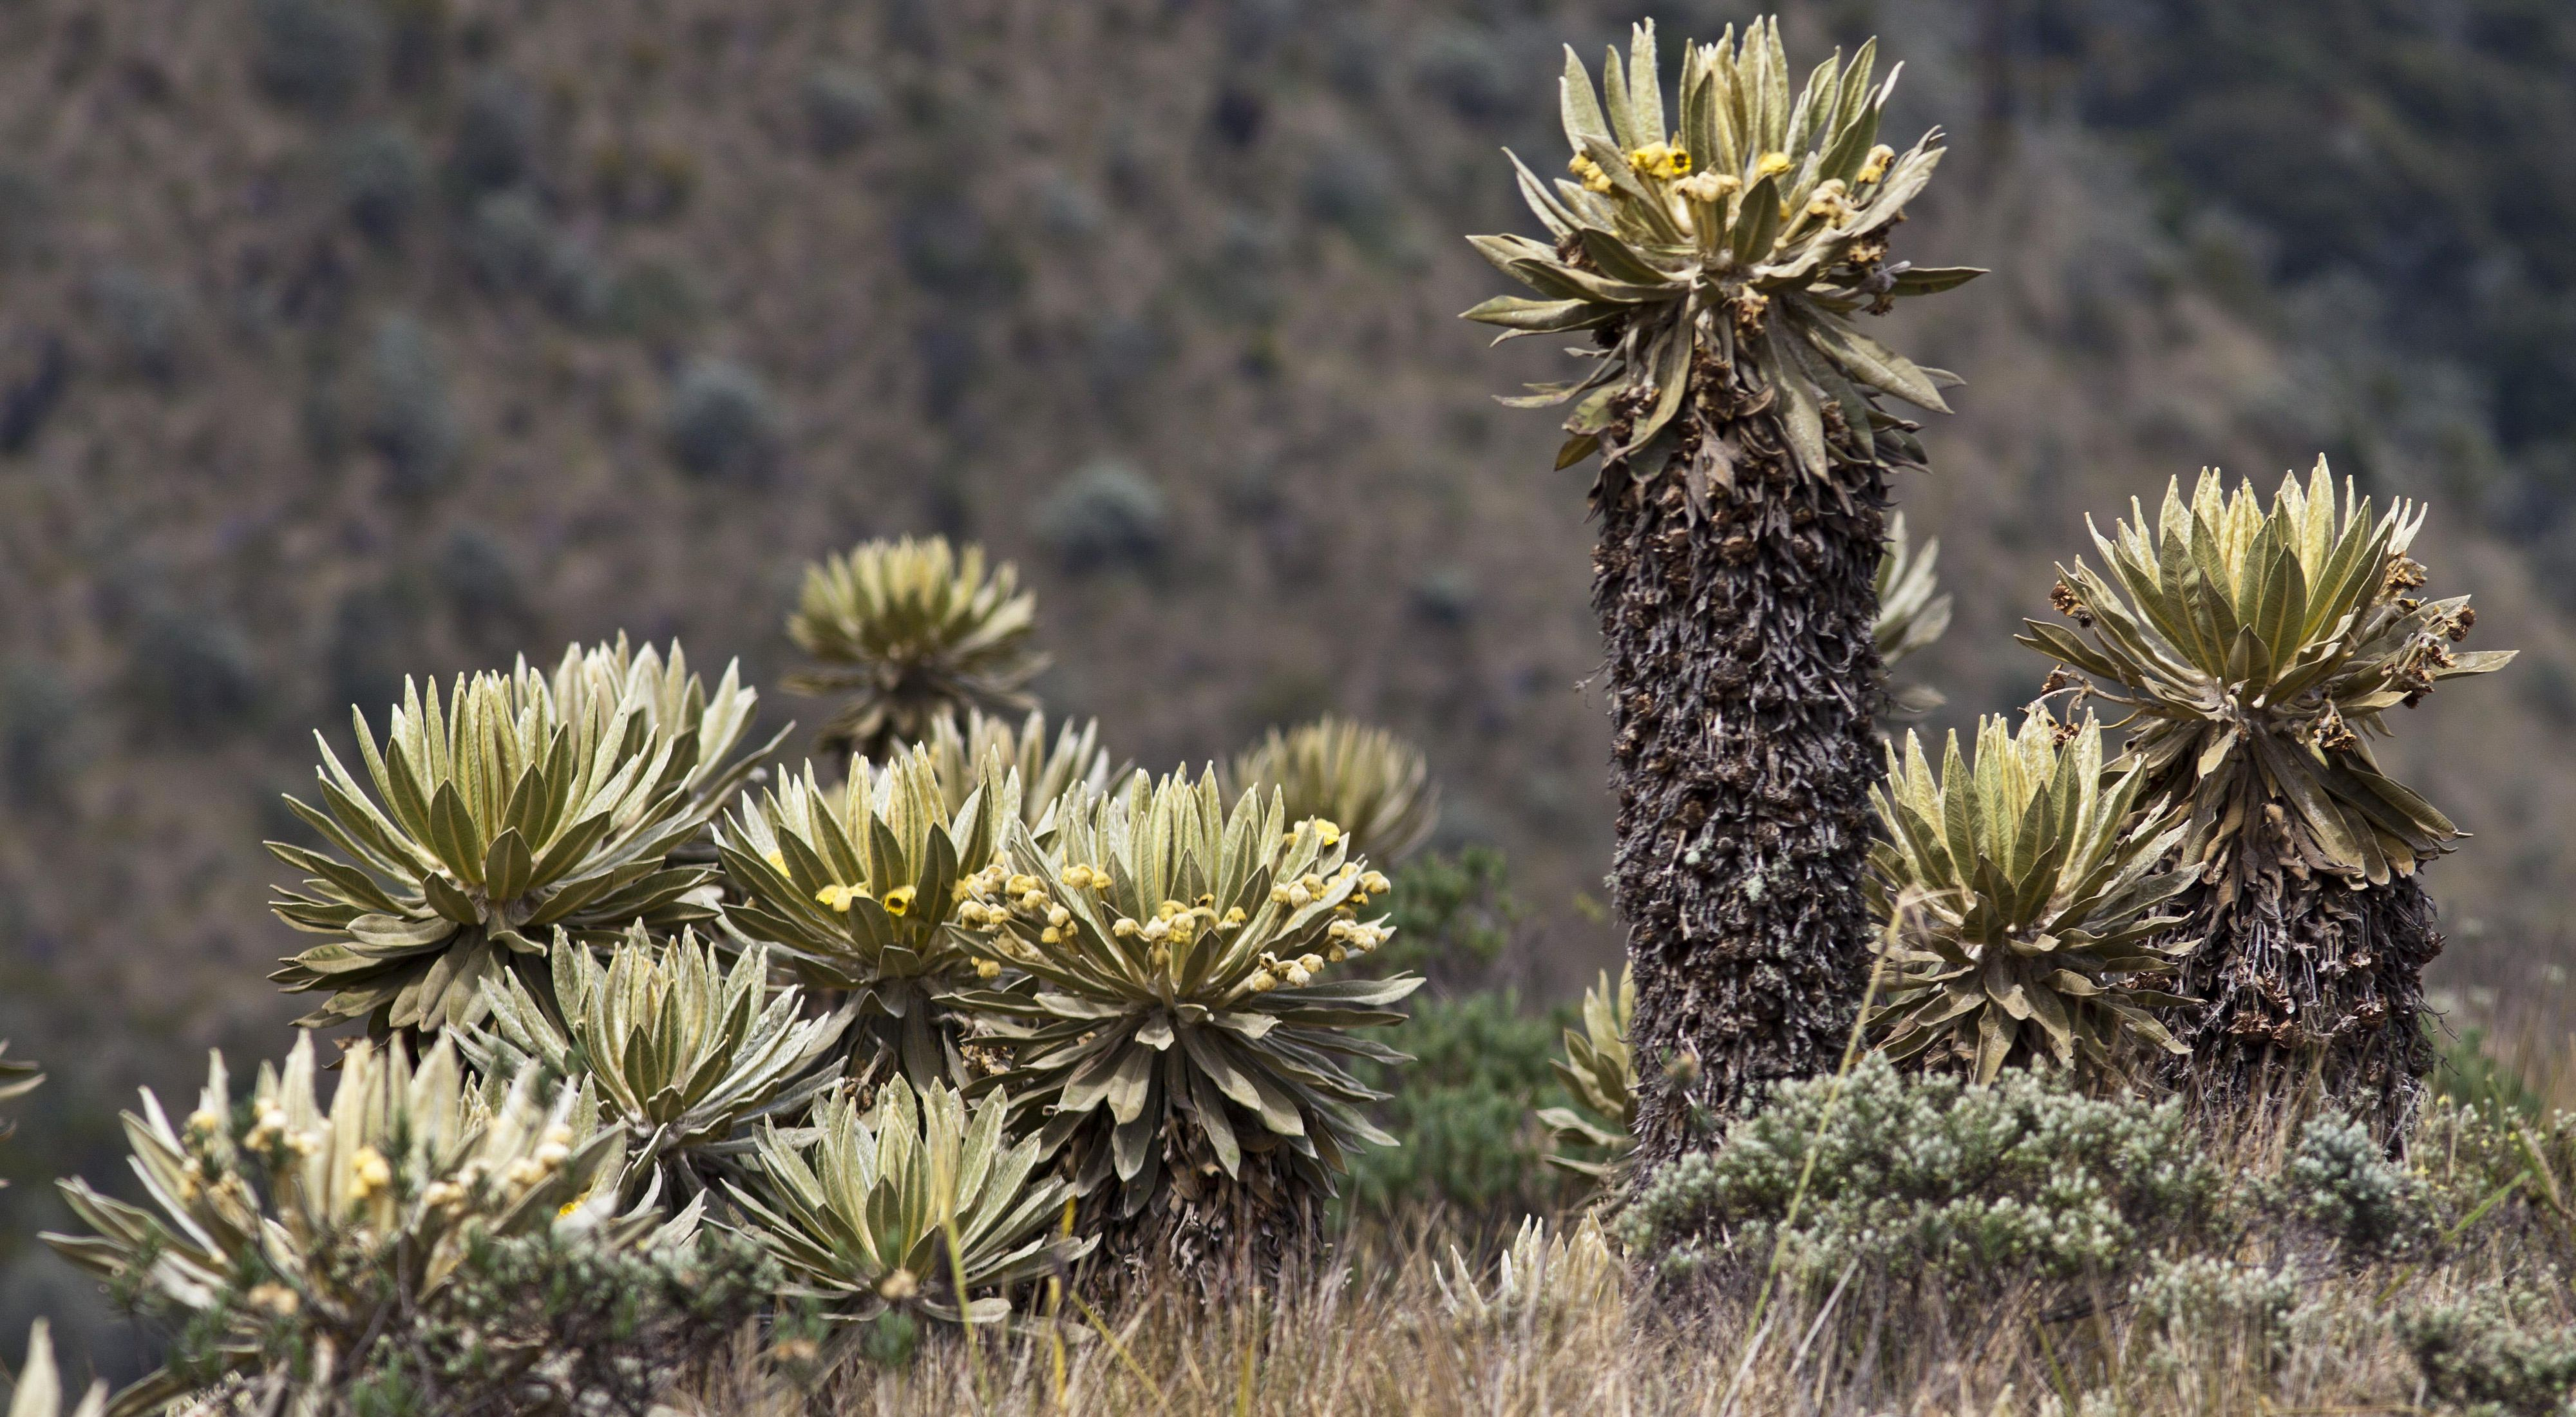 Parque Nacional Chingaza